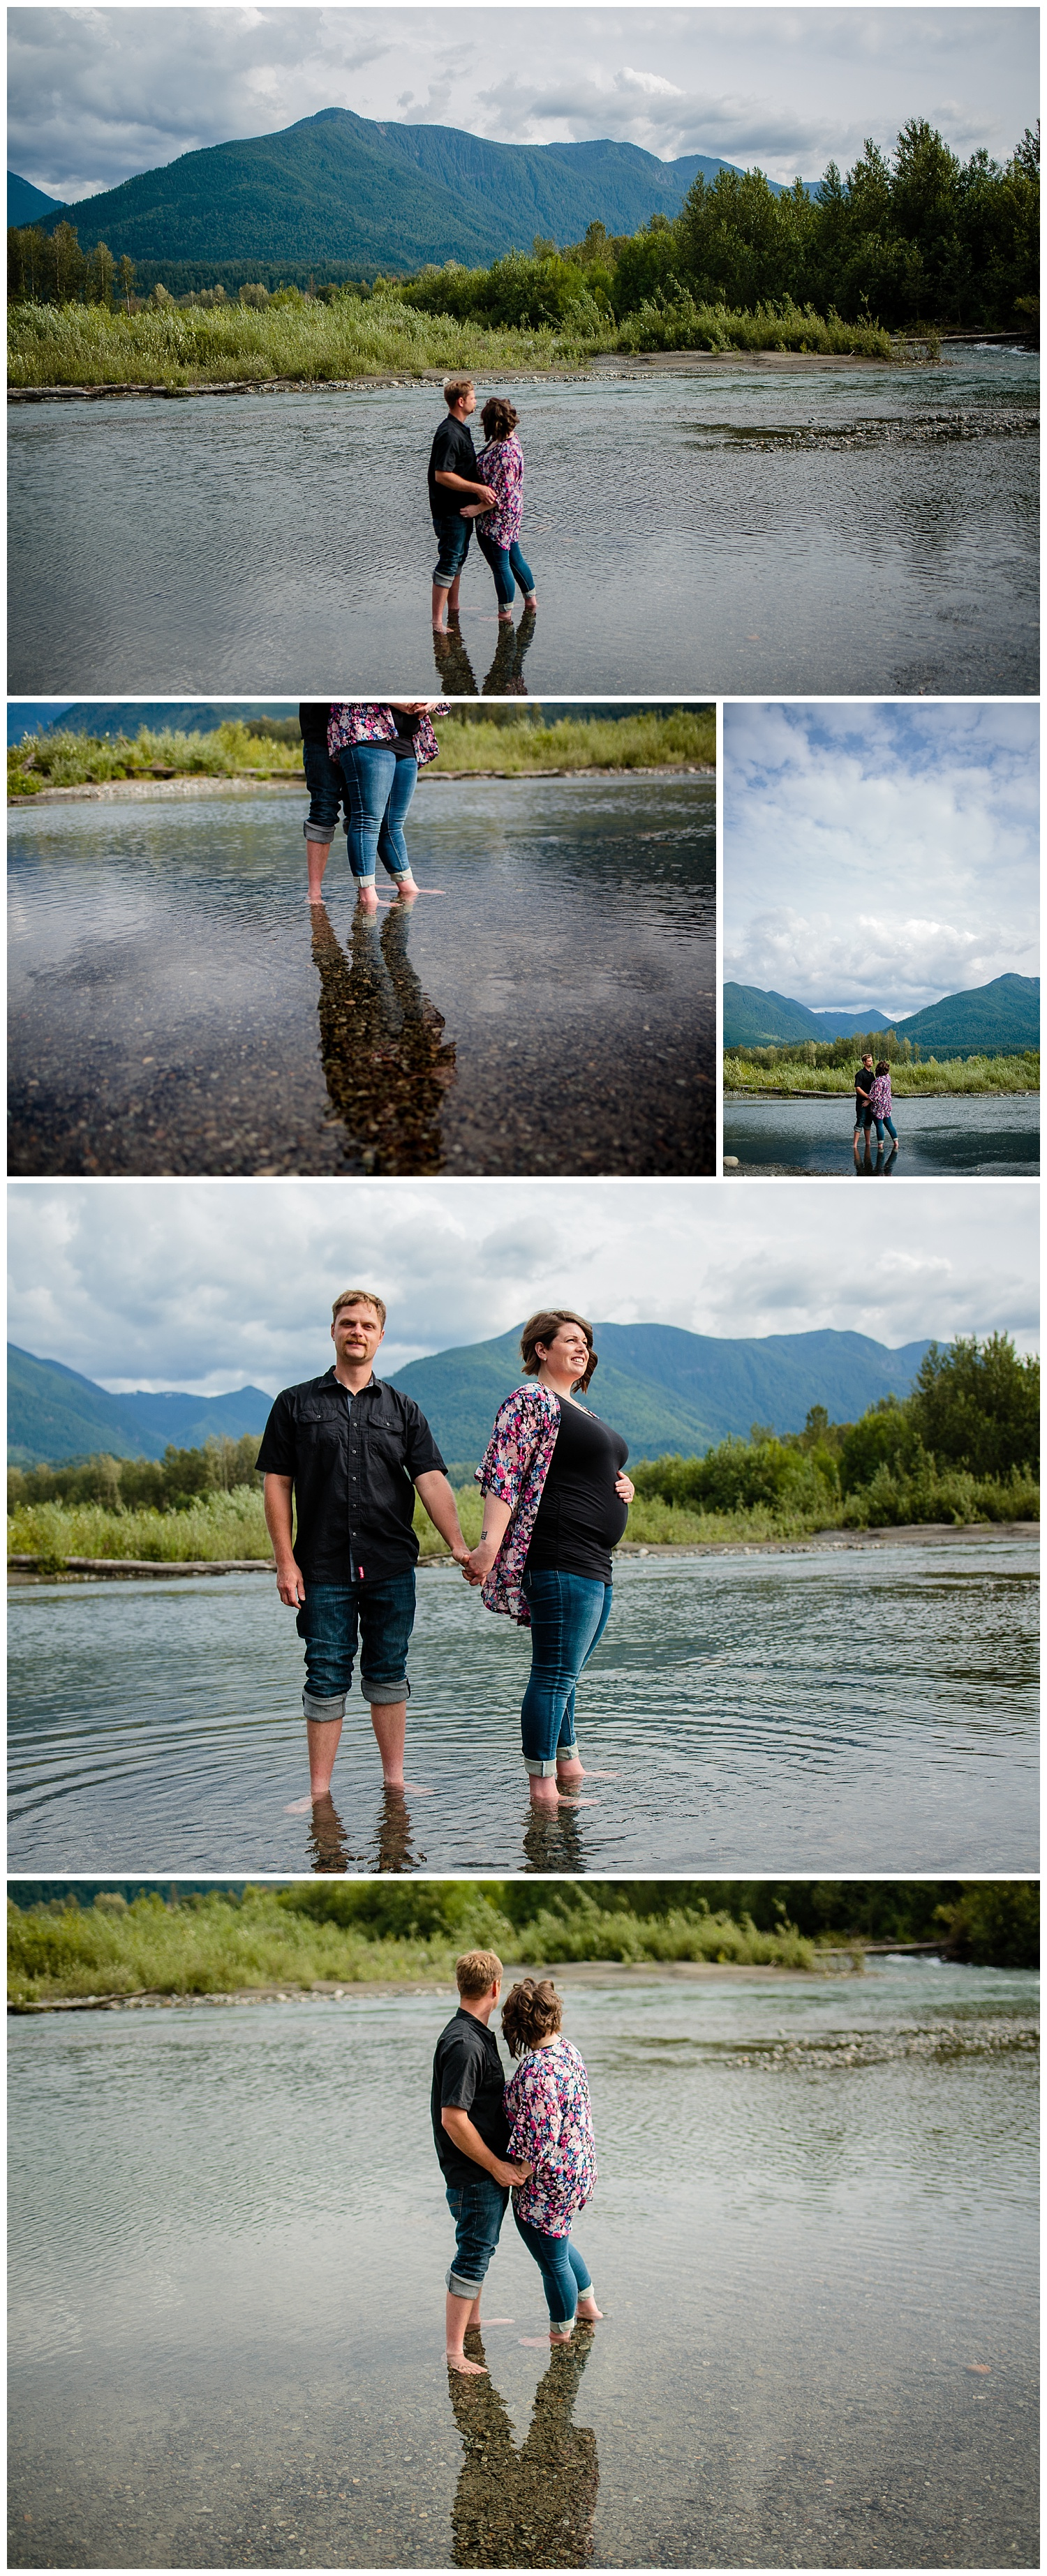 Chilliwack River Bank Mountain Chilliwack Fun  Engagement Photographer 171_collage.jpg